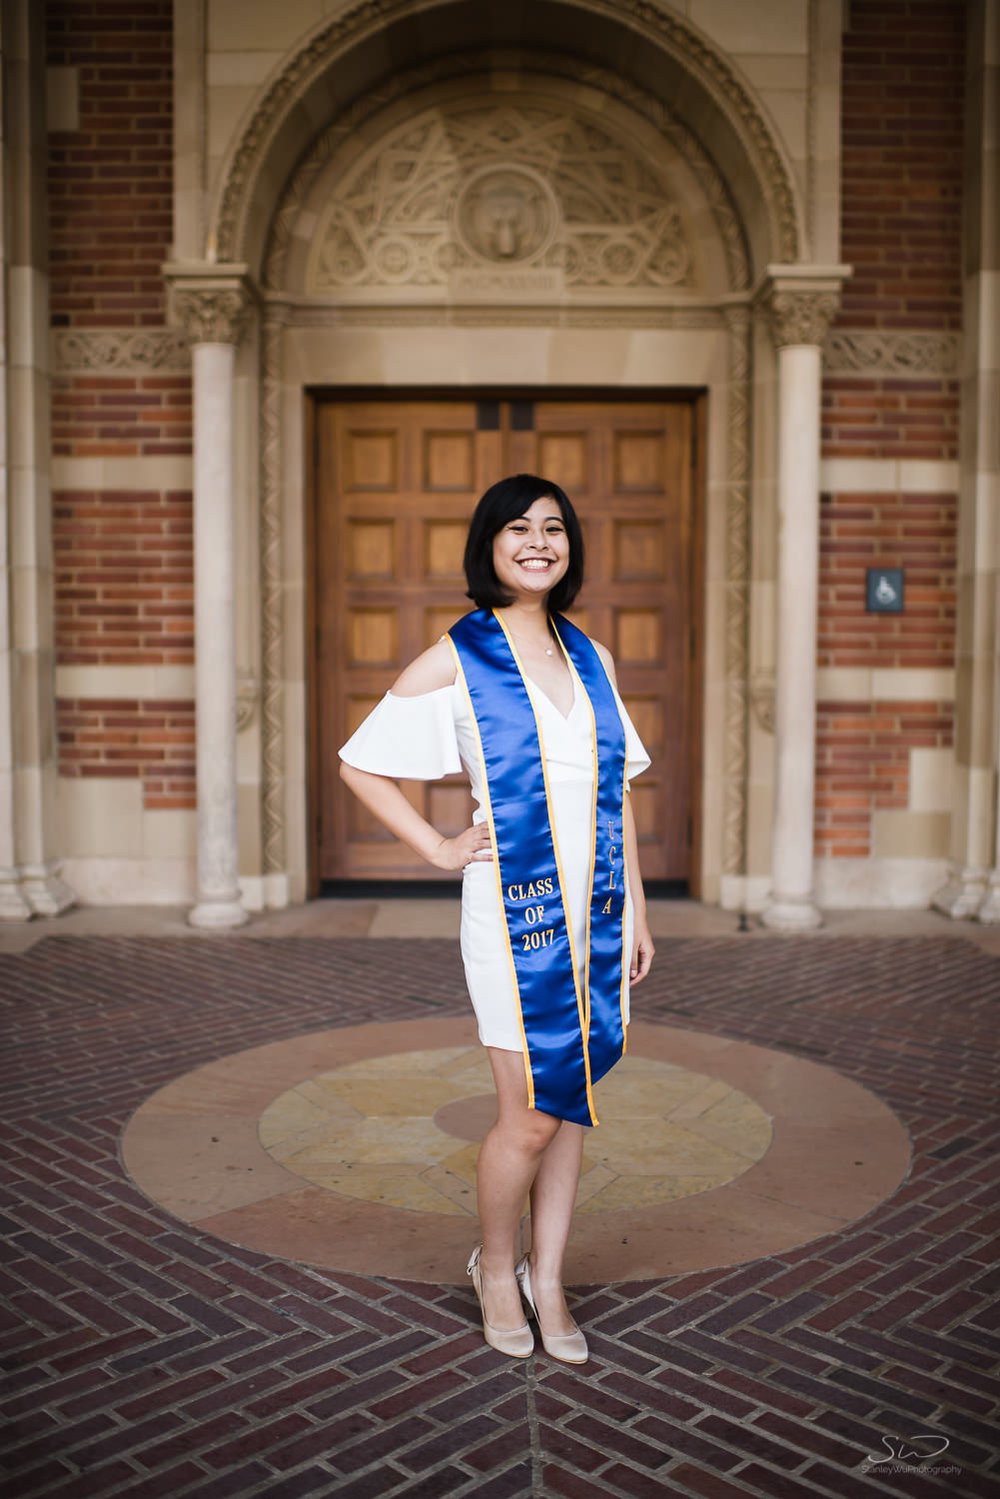 Copy of Copy of portrait of a college senior | Stanley Wu Photography | Los Angeles | Graduation Portraits | UCLA, USC, LMU, Pepperdine, CSULA, CSUN, CSULB, UCI, UCSD